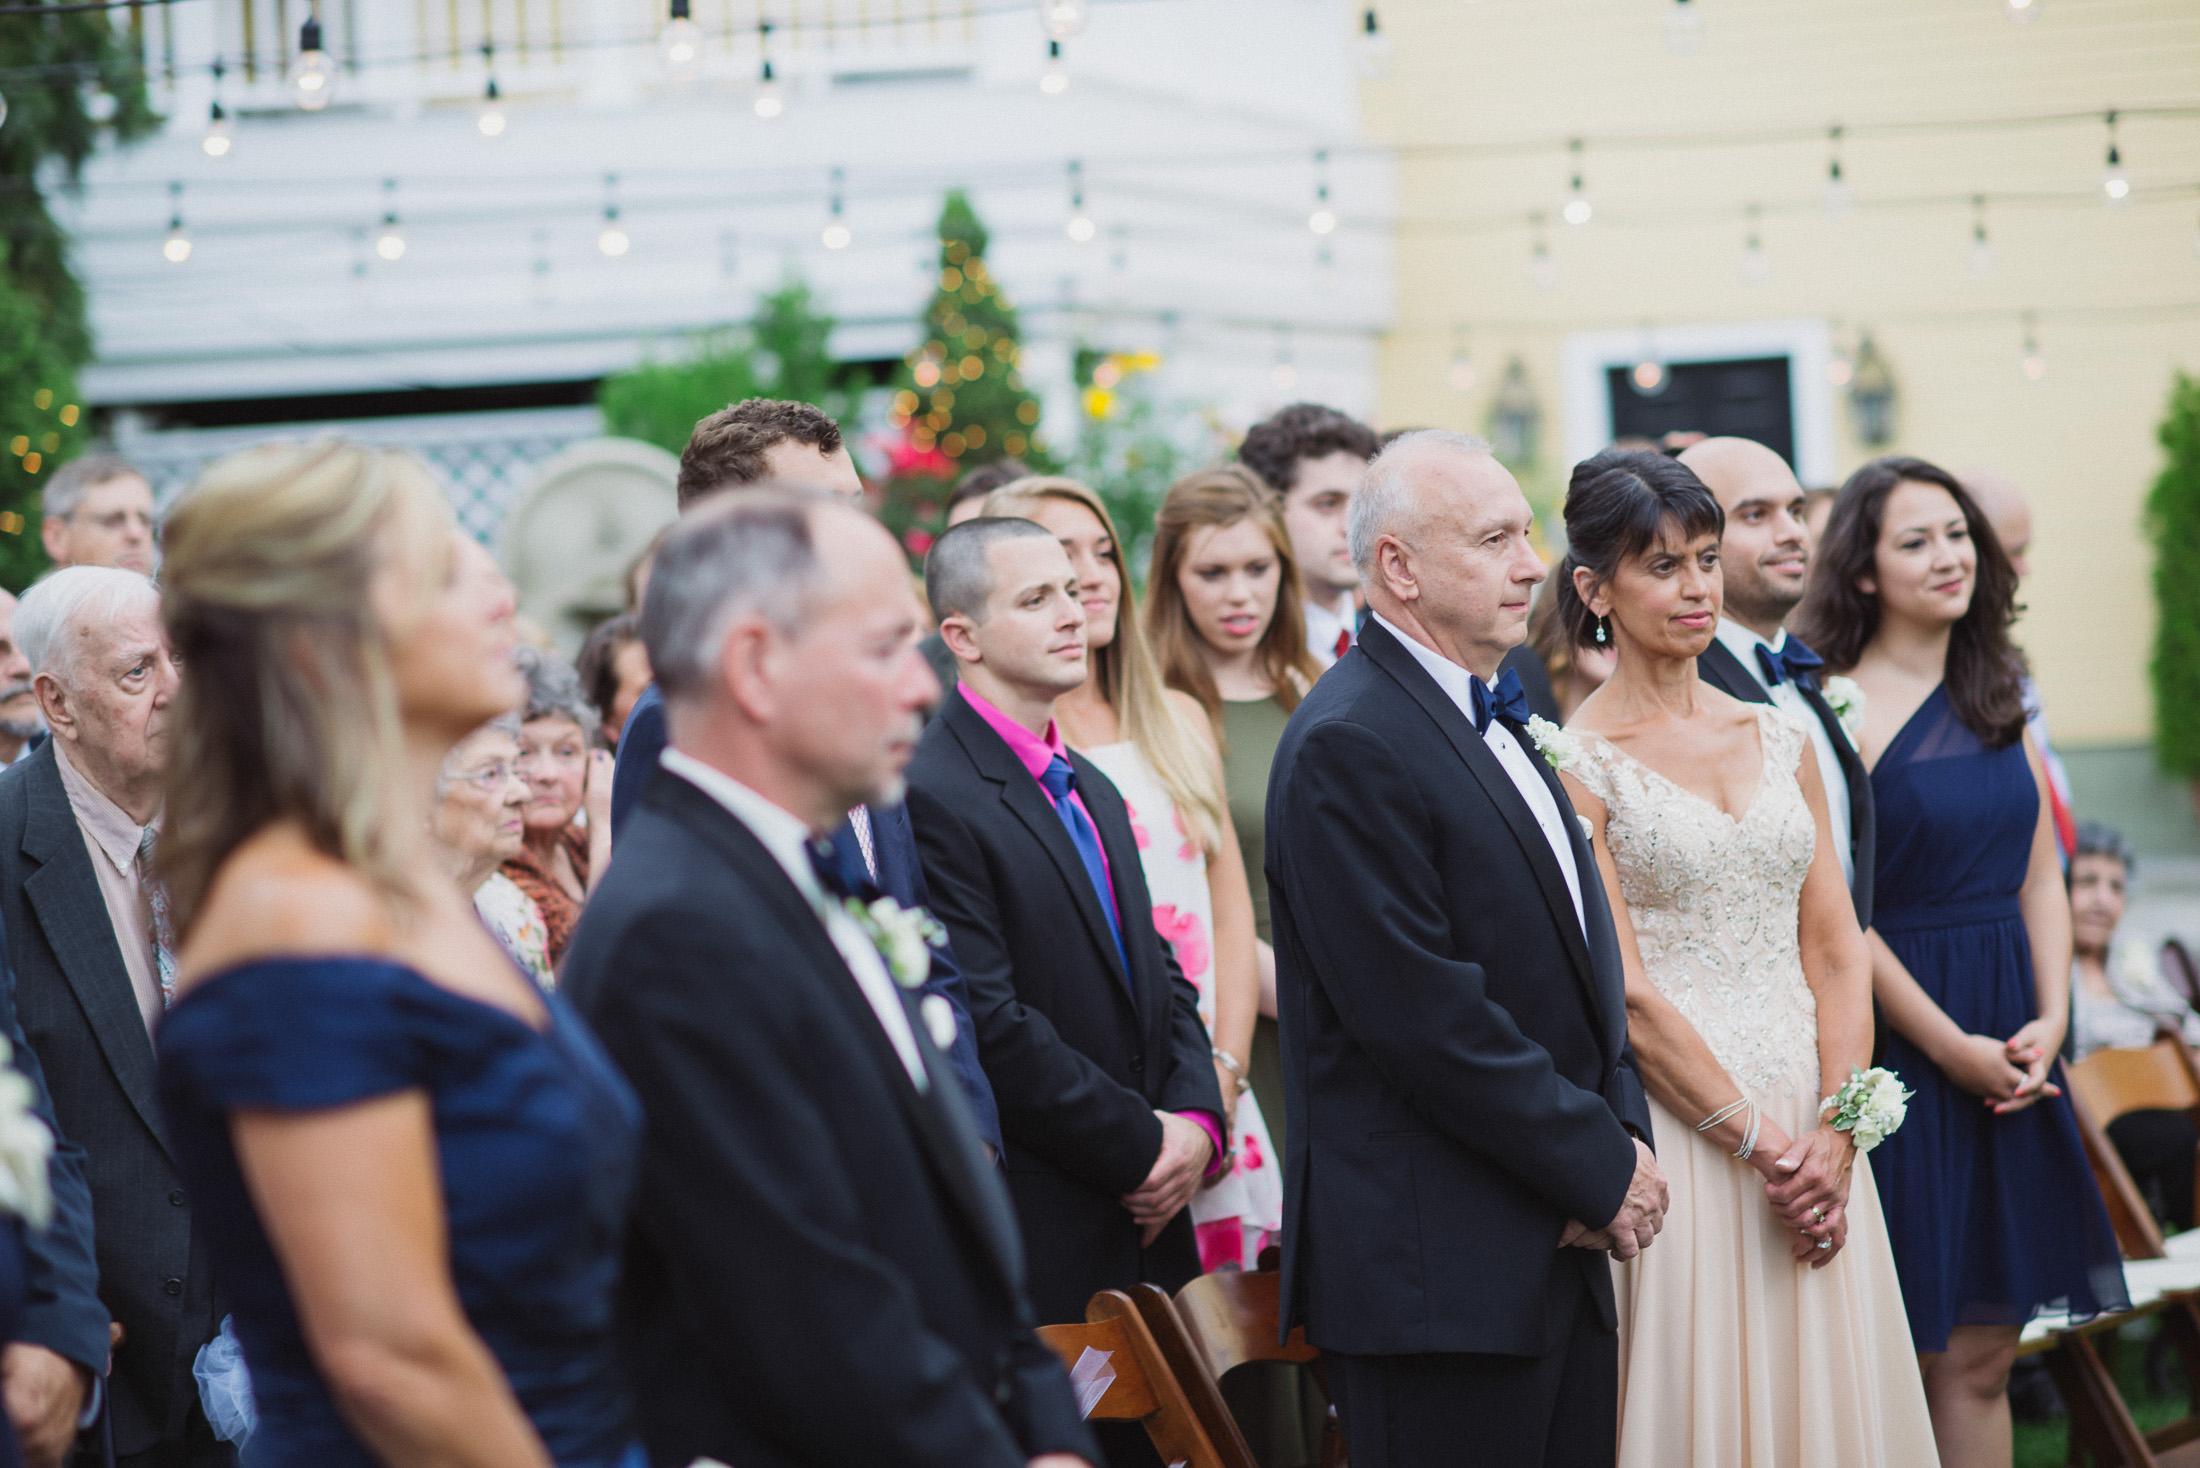 NH Wedding Photographer: parents of couple